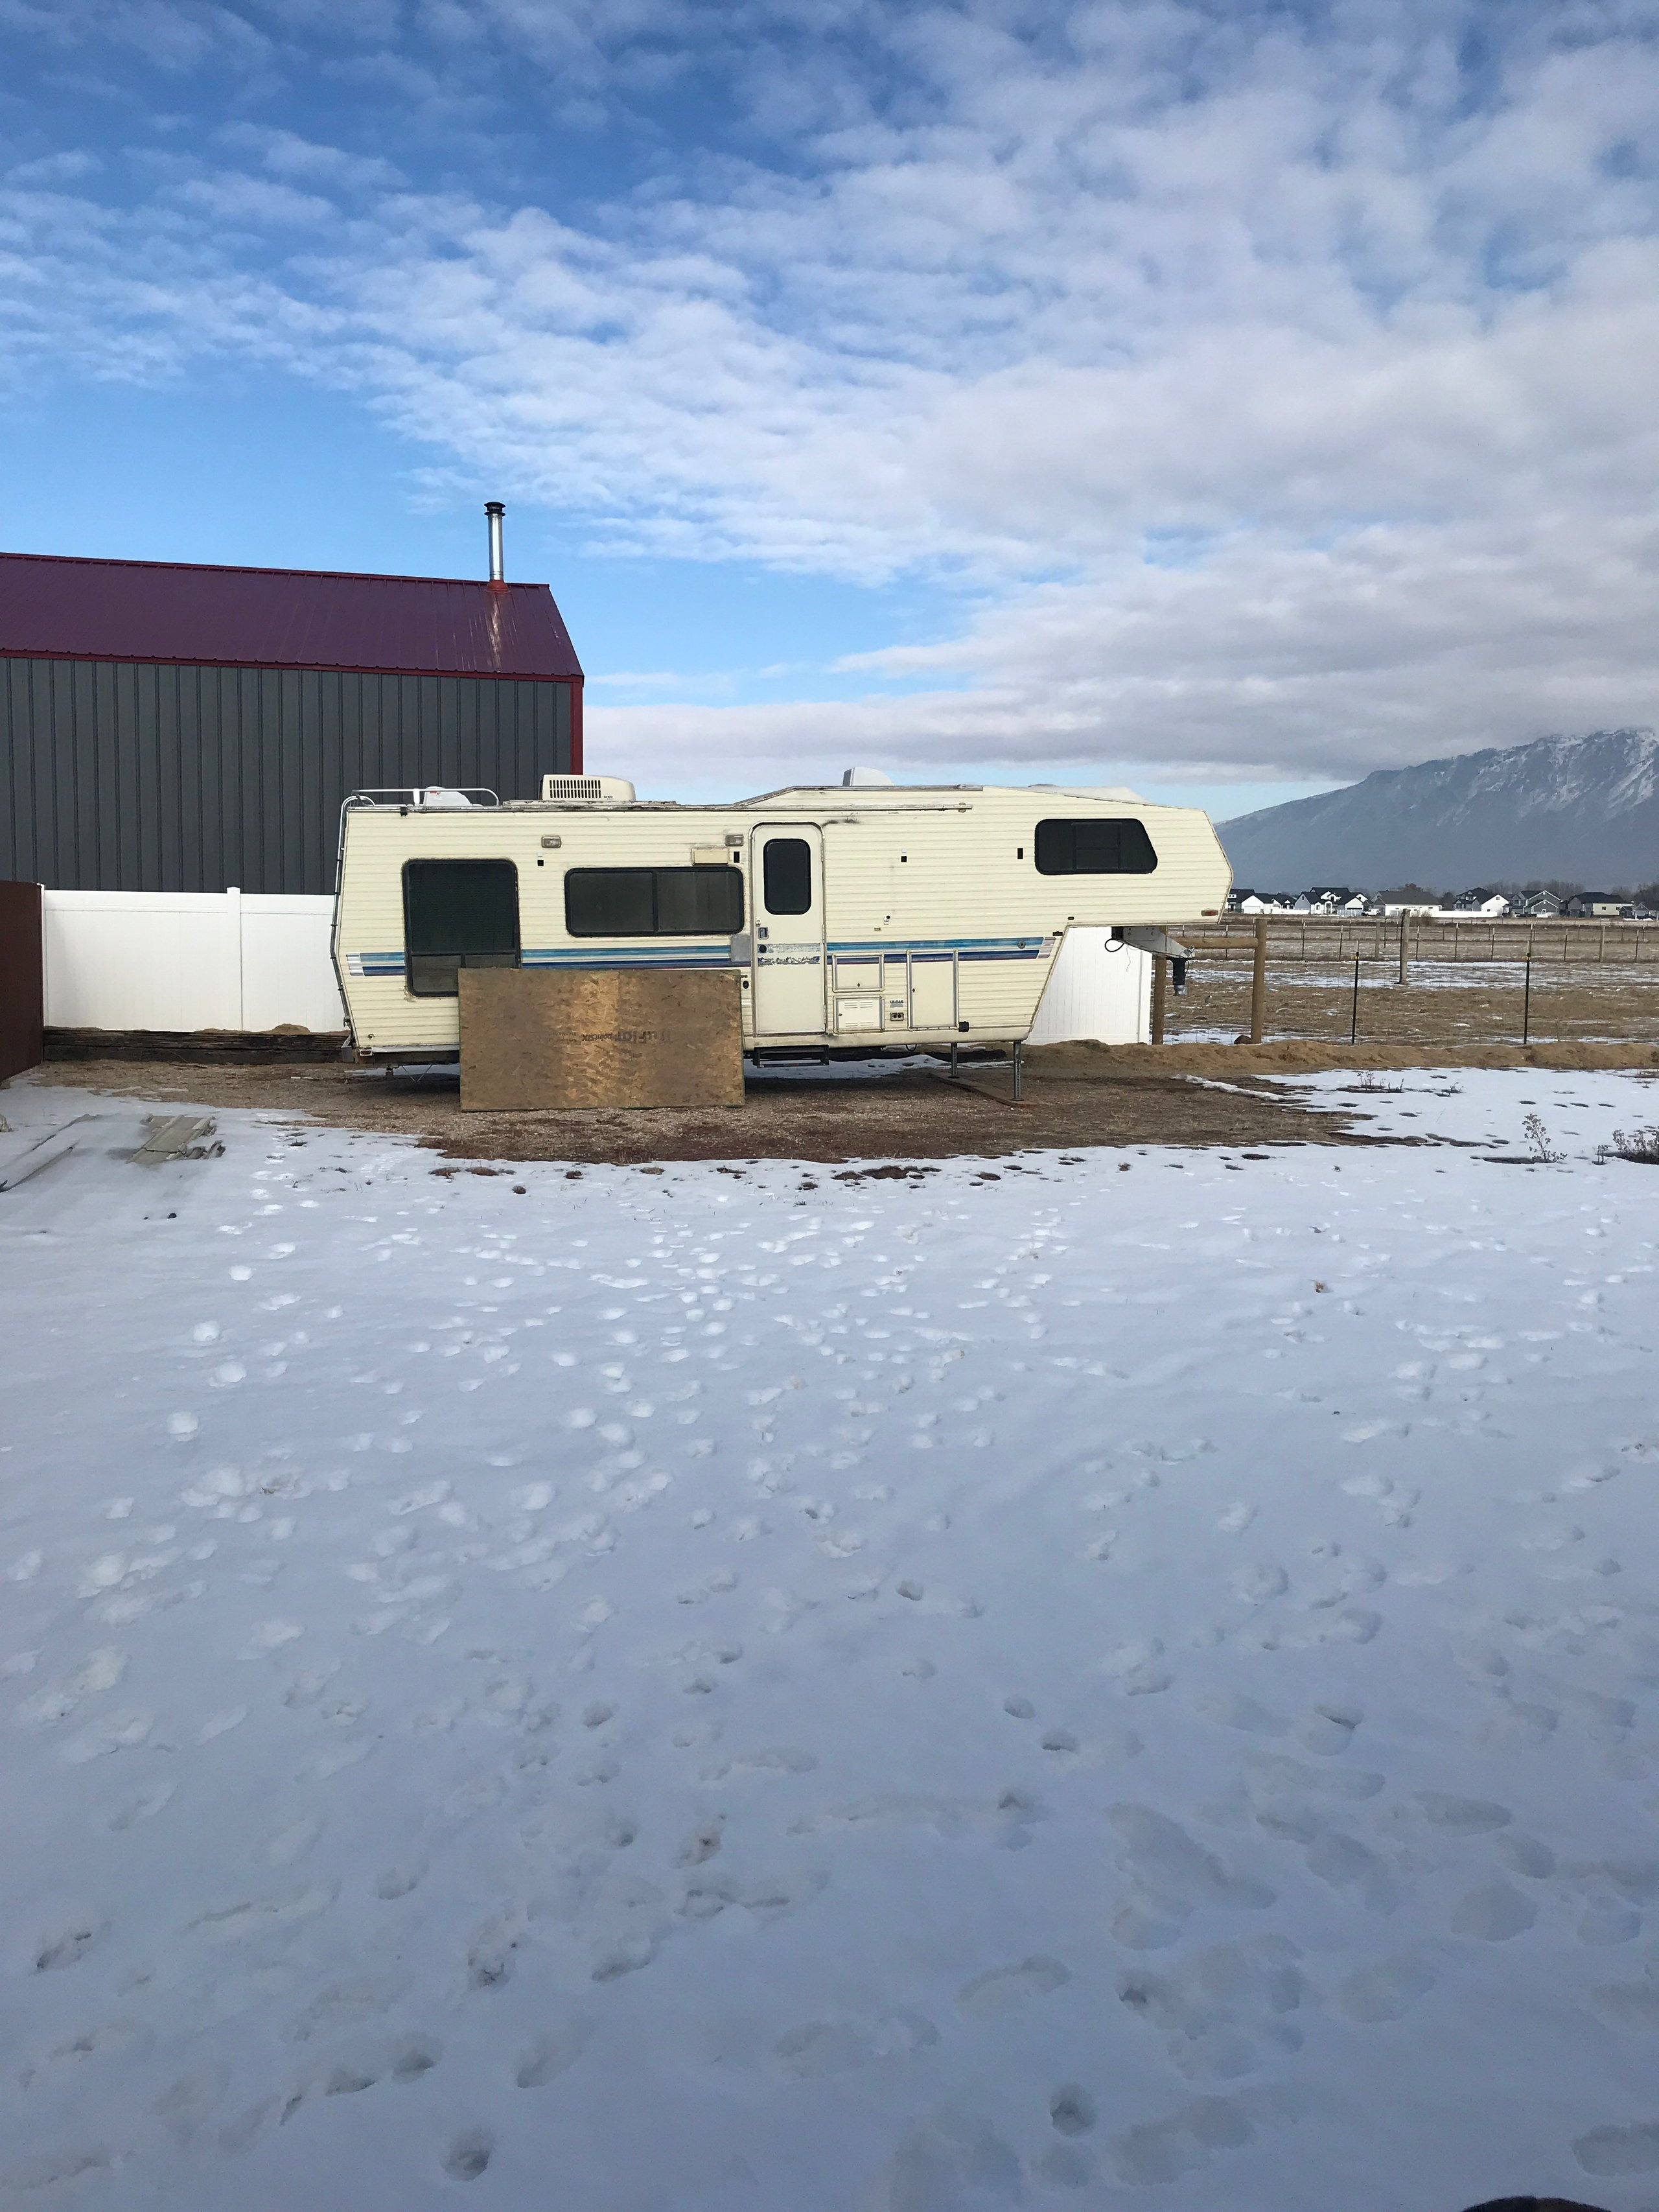 50x15 Unpaved Lot self storage unit